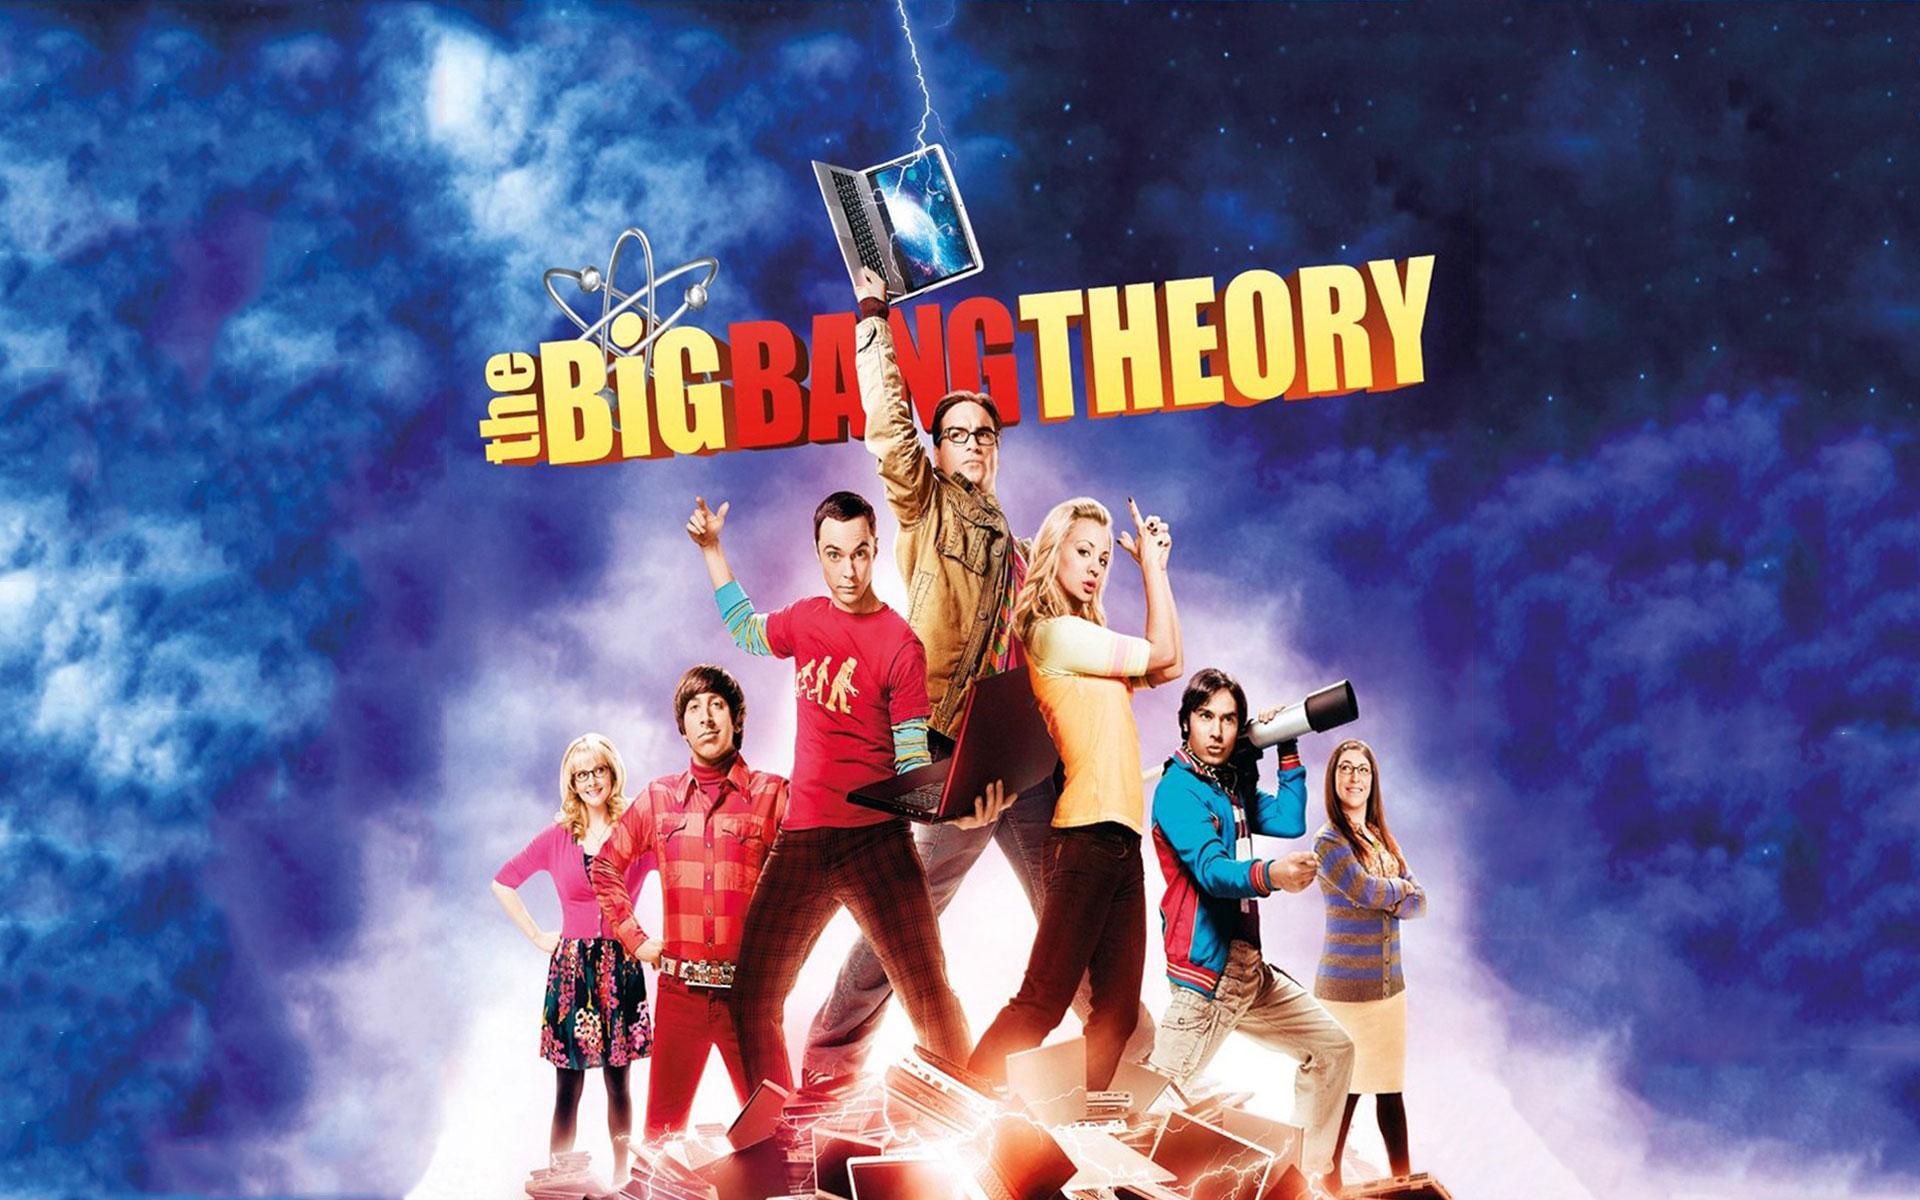 Pendy Iphone X Wallpaper The Big Bang Theory Full Hd Sfondo And Sfondi 1920x1200